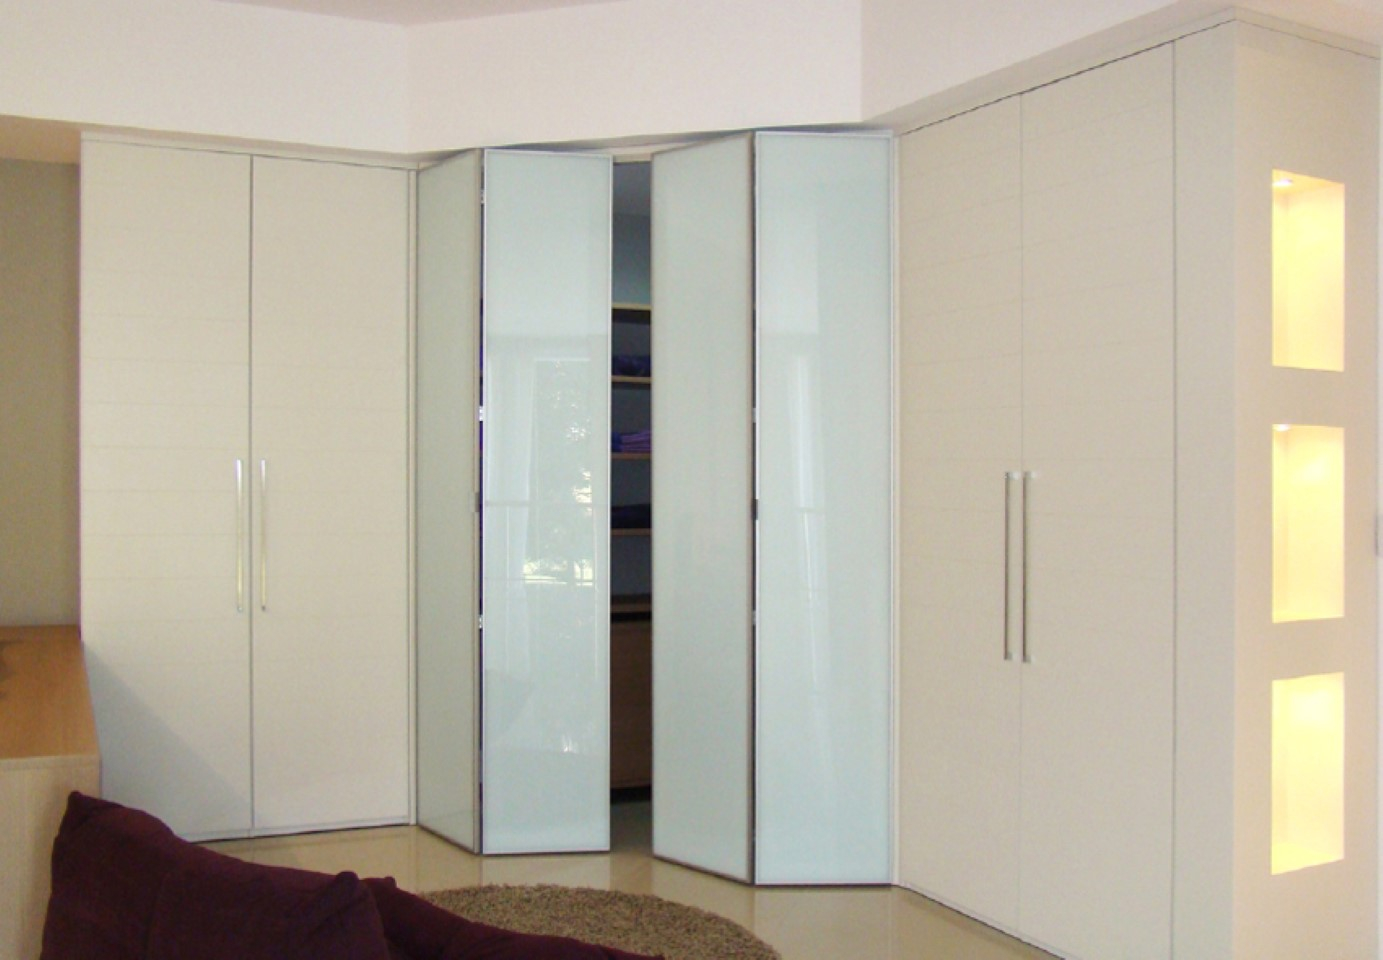 14.SIMPHOME.COM wood sliding closet doors for modern bedrooms